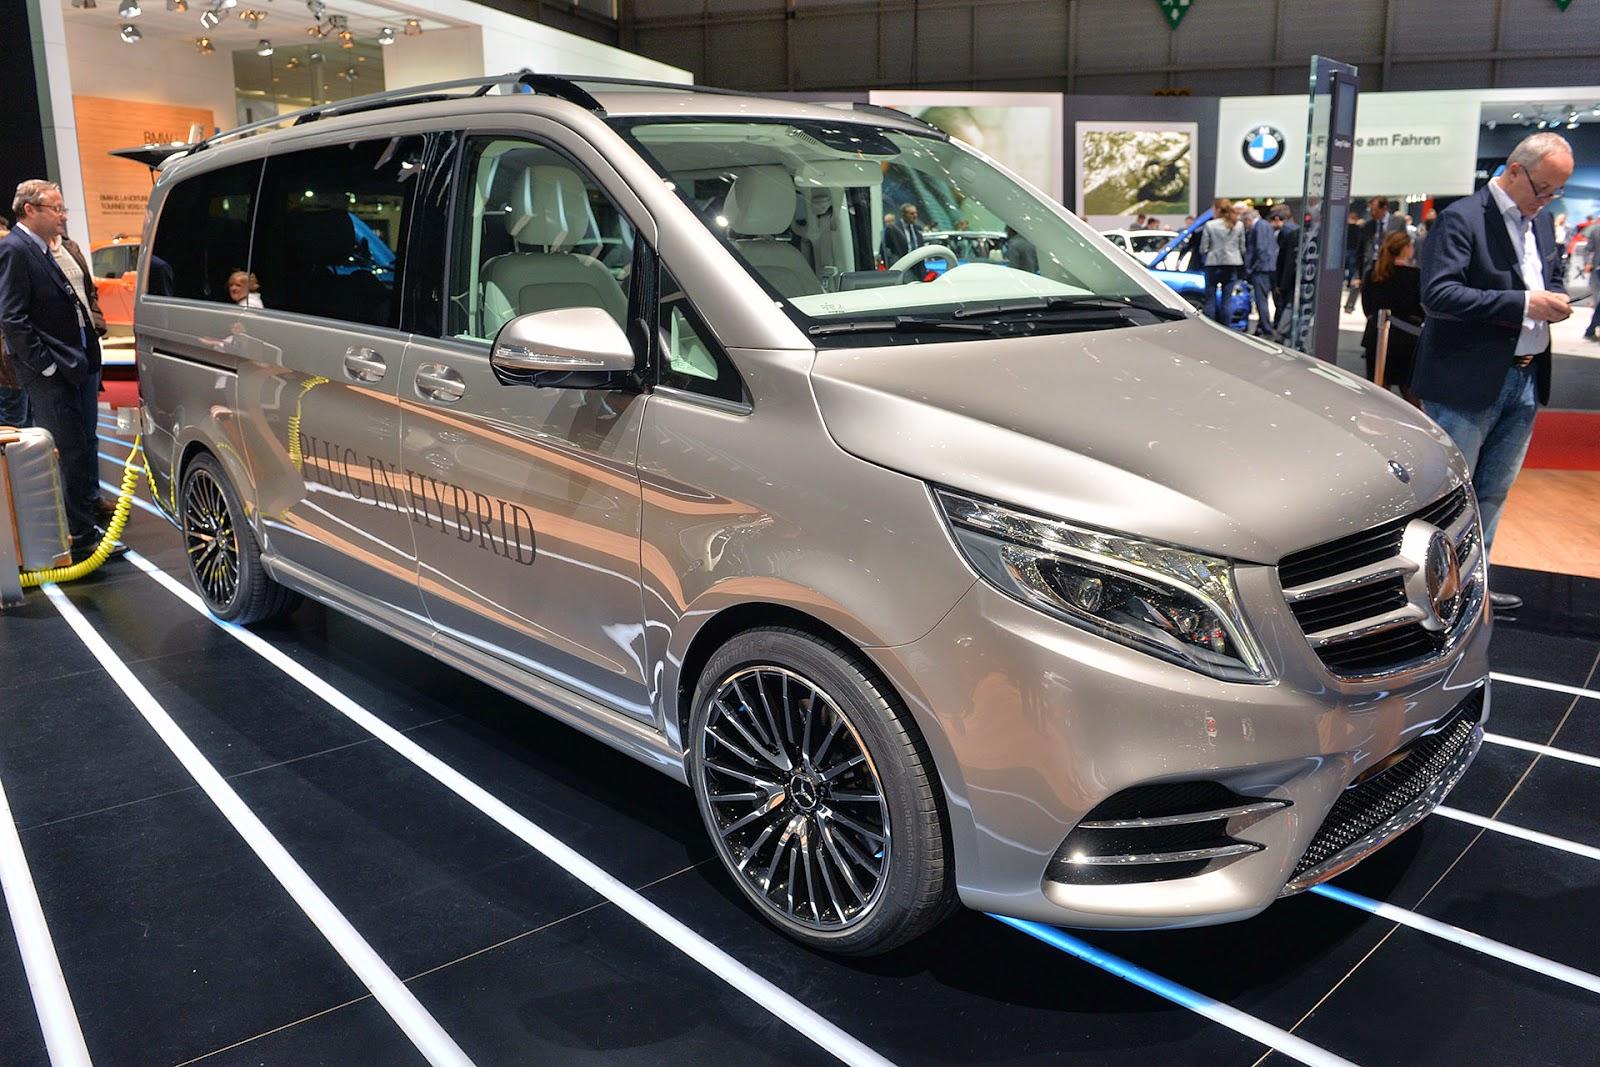 minivan vip mercedes gcc for cars viano benz on interior find luxury sale spec jamesedition